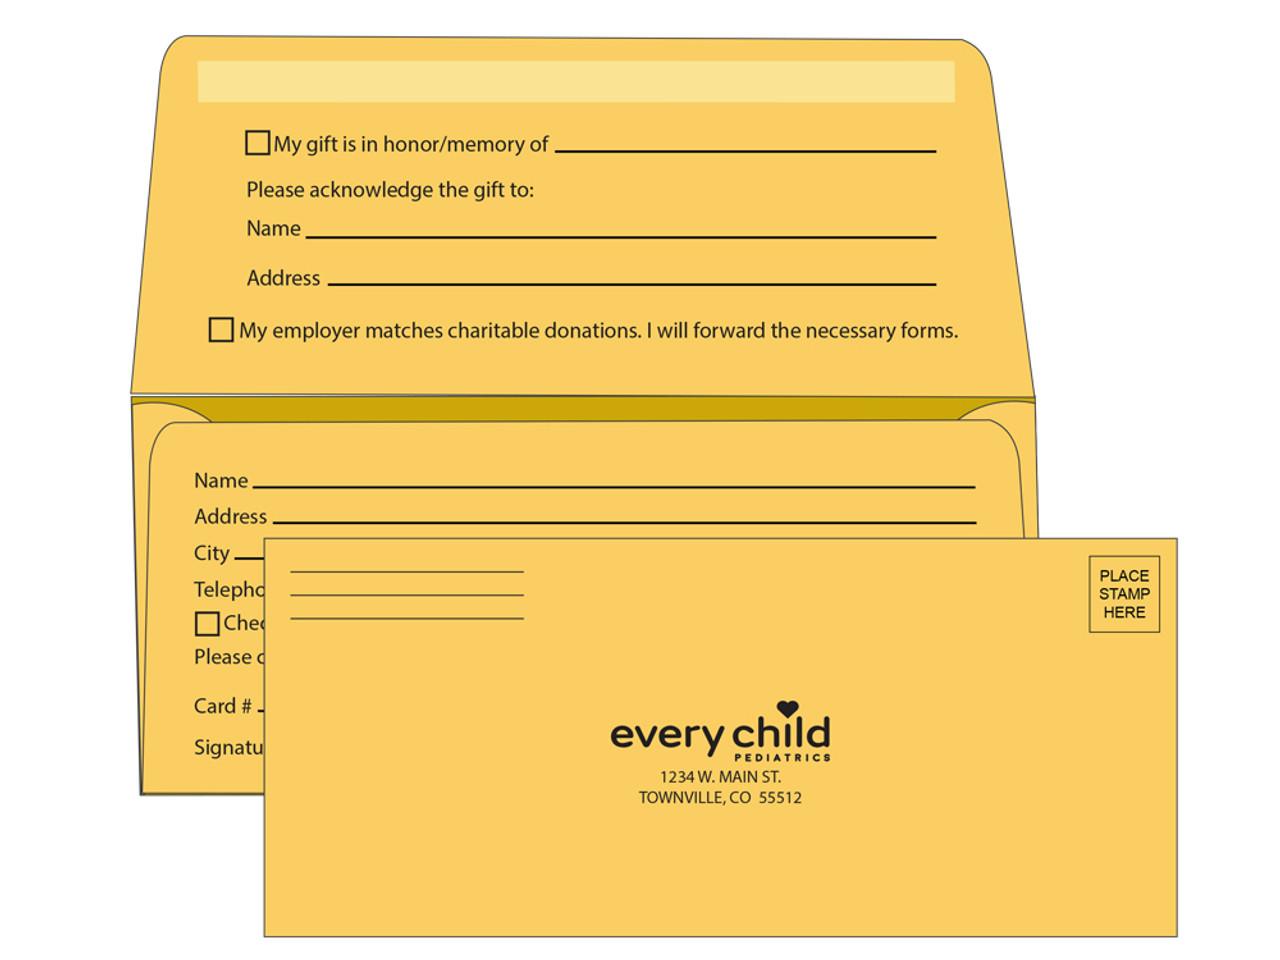 9 Remittance Envelopes | Remittance Envelopes for Fundraising - EN1096